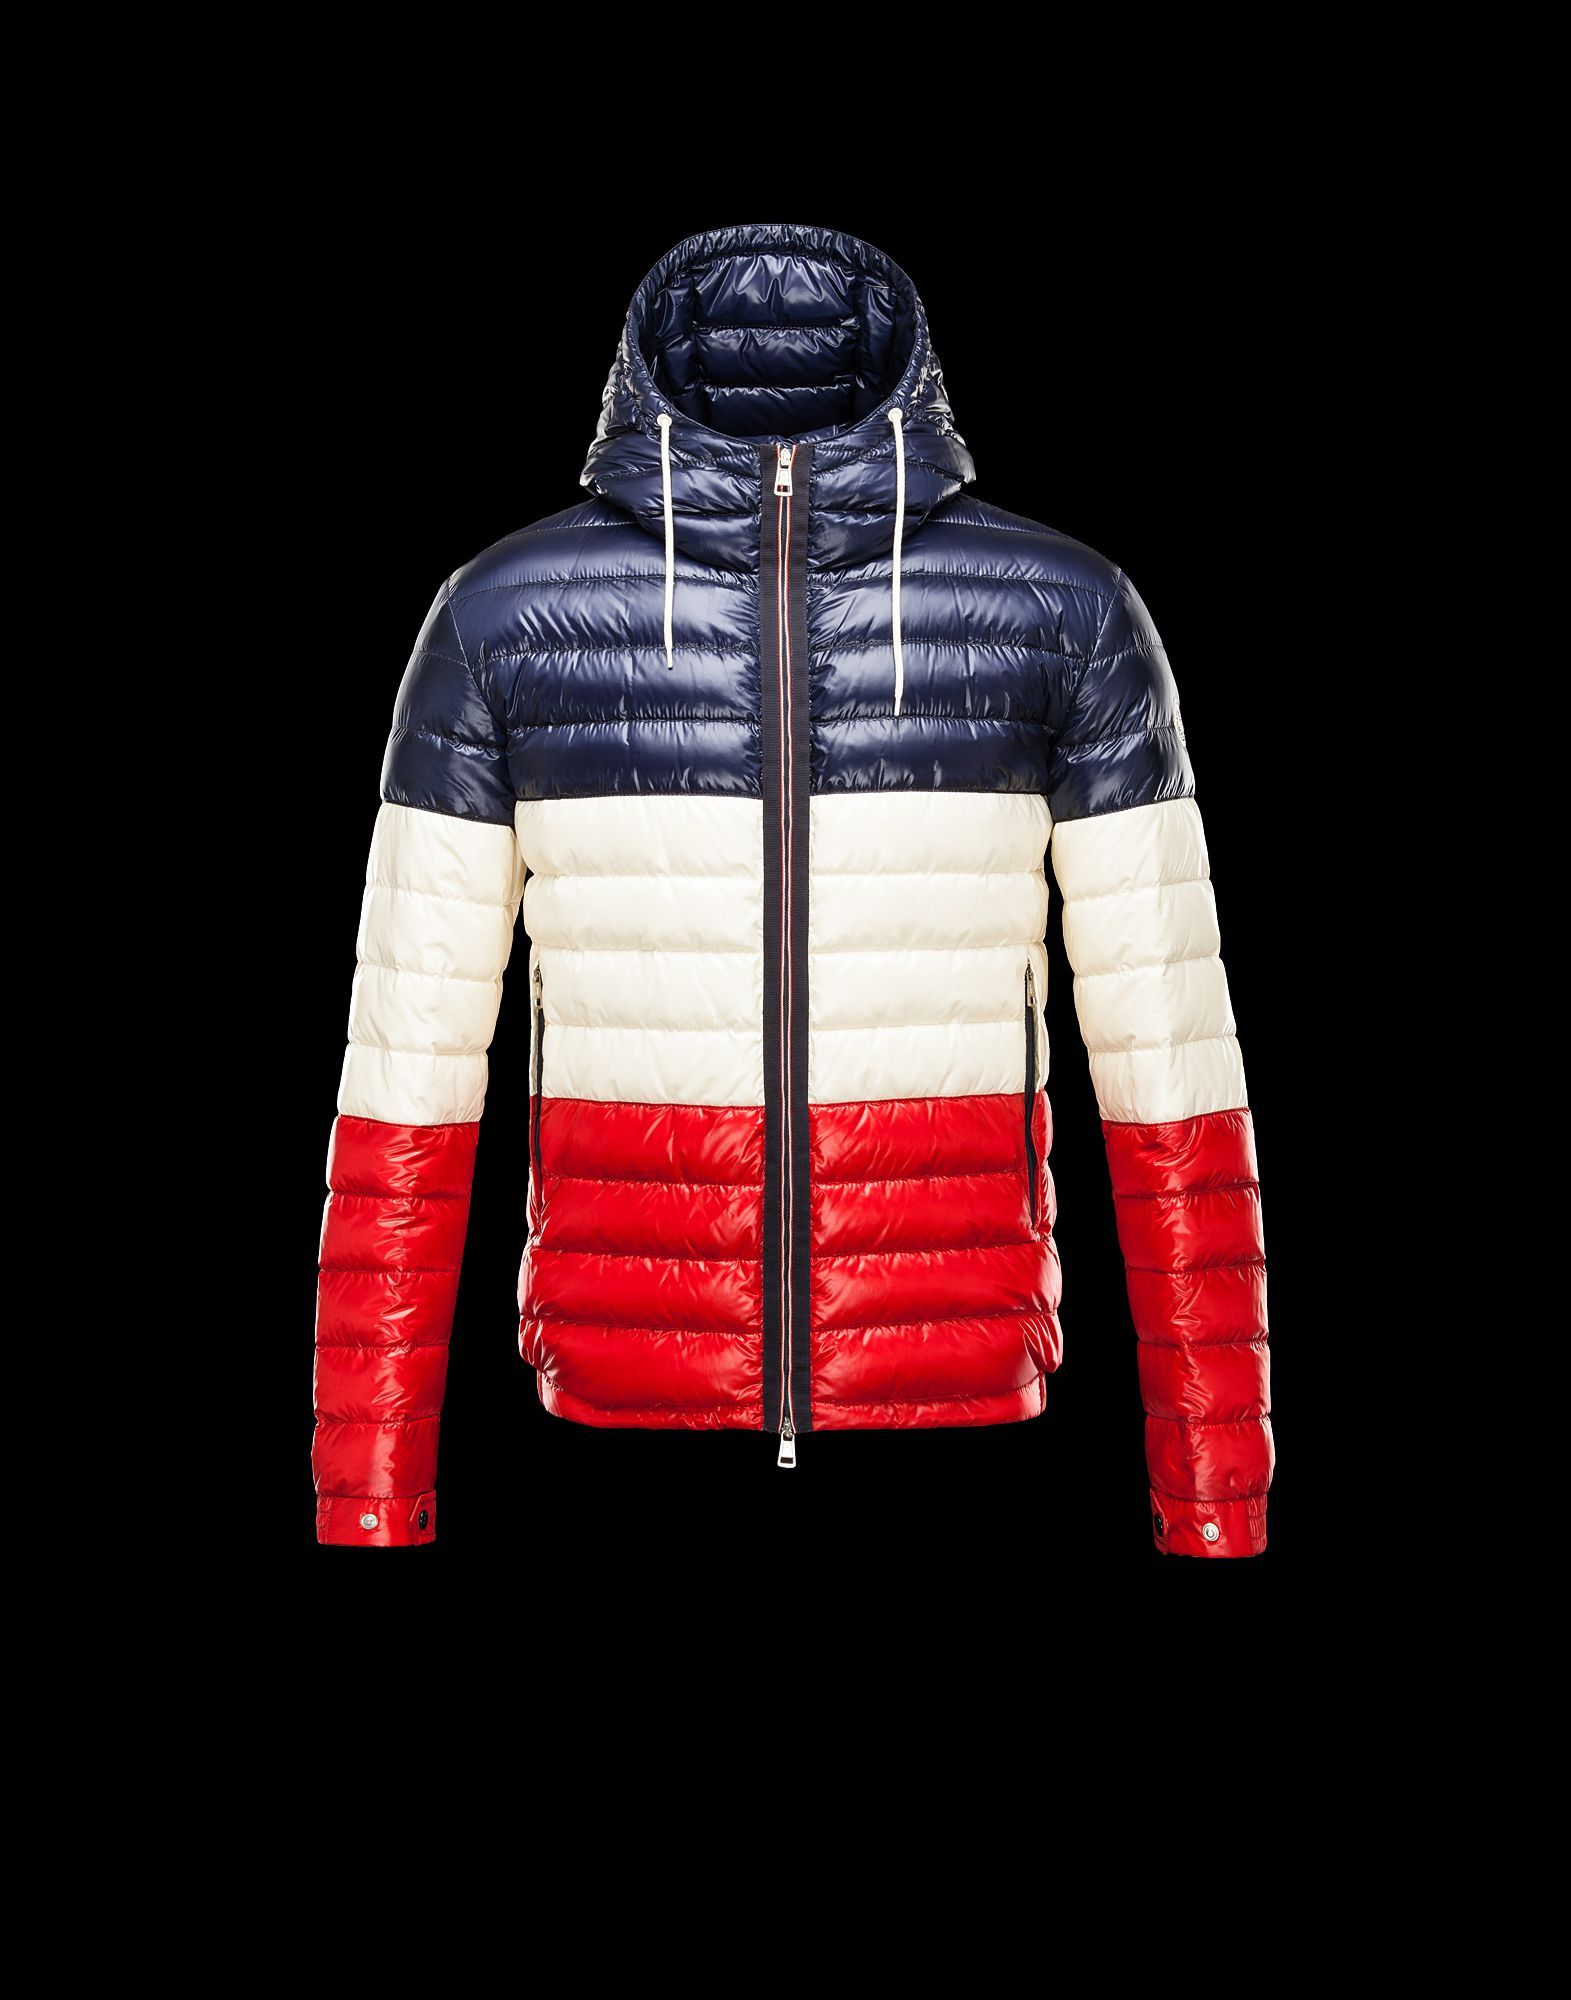 ropa esqui hombre moncler